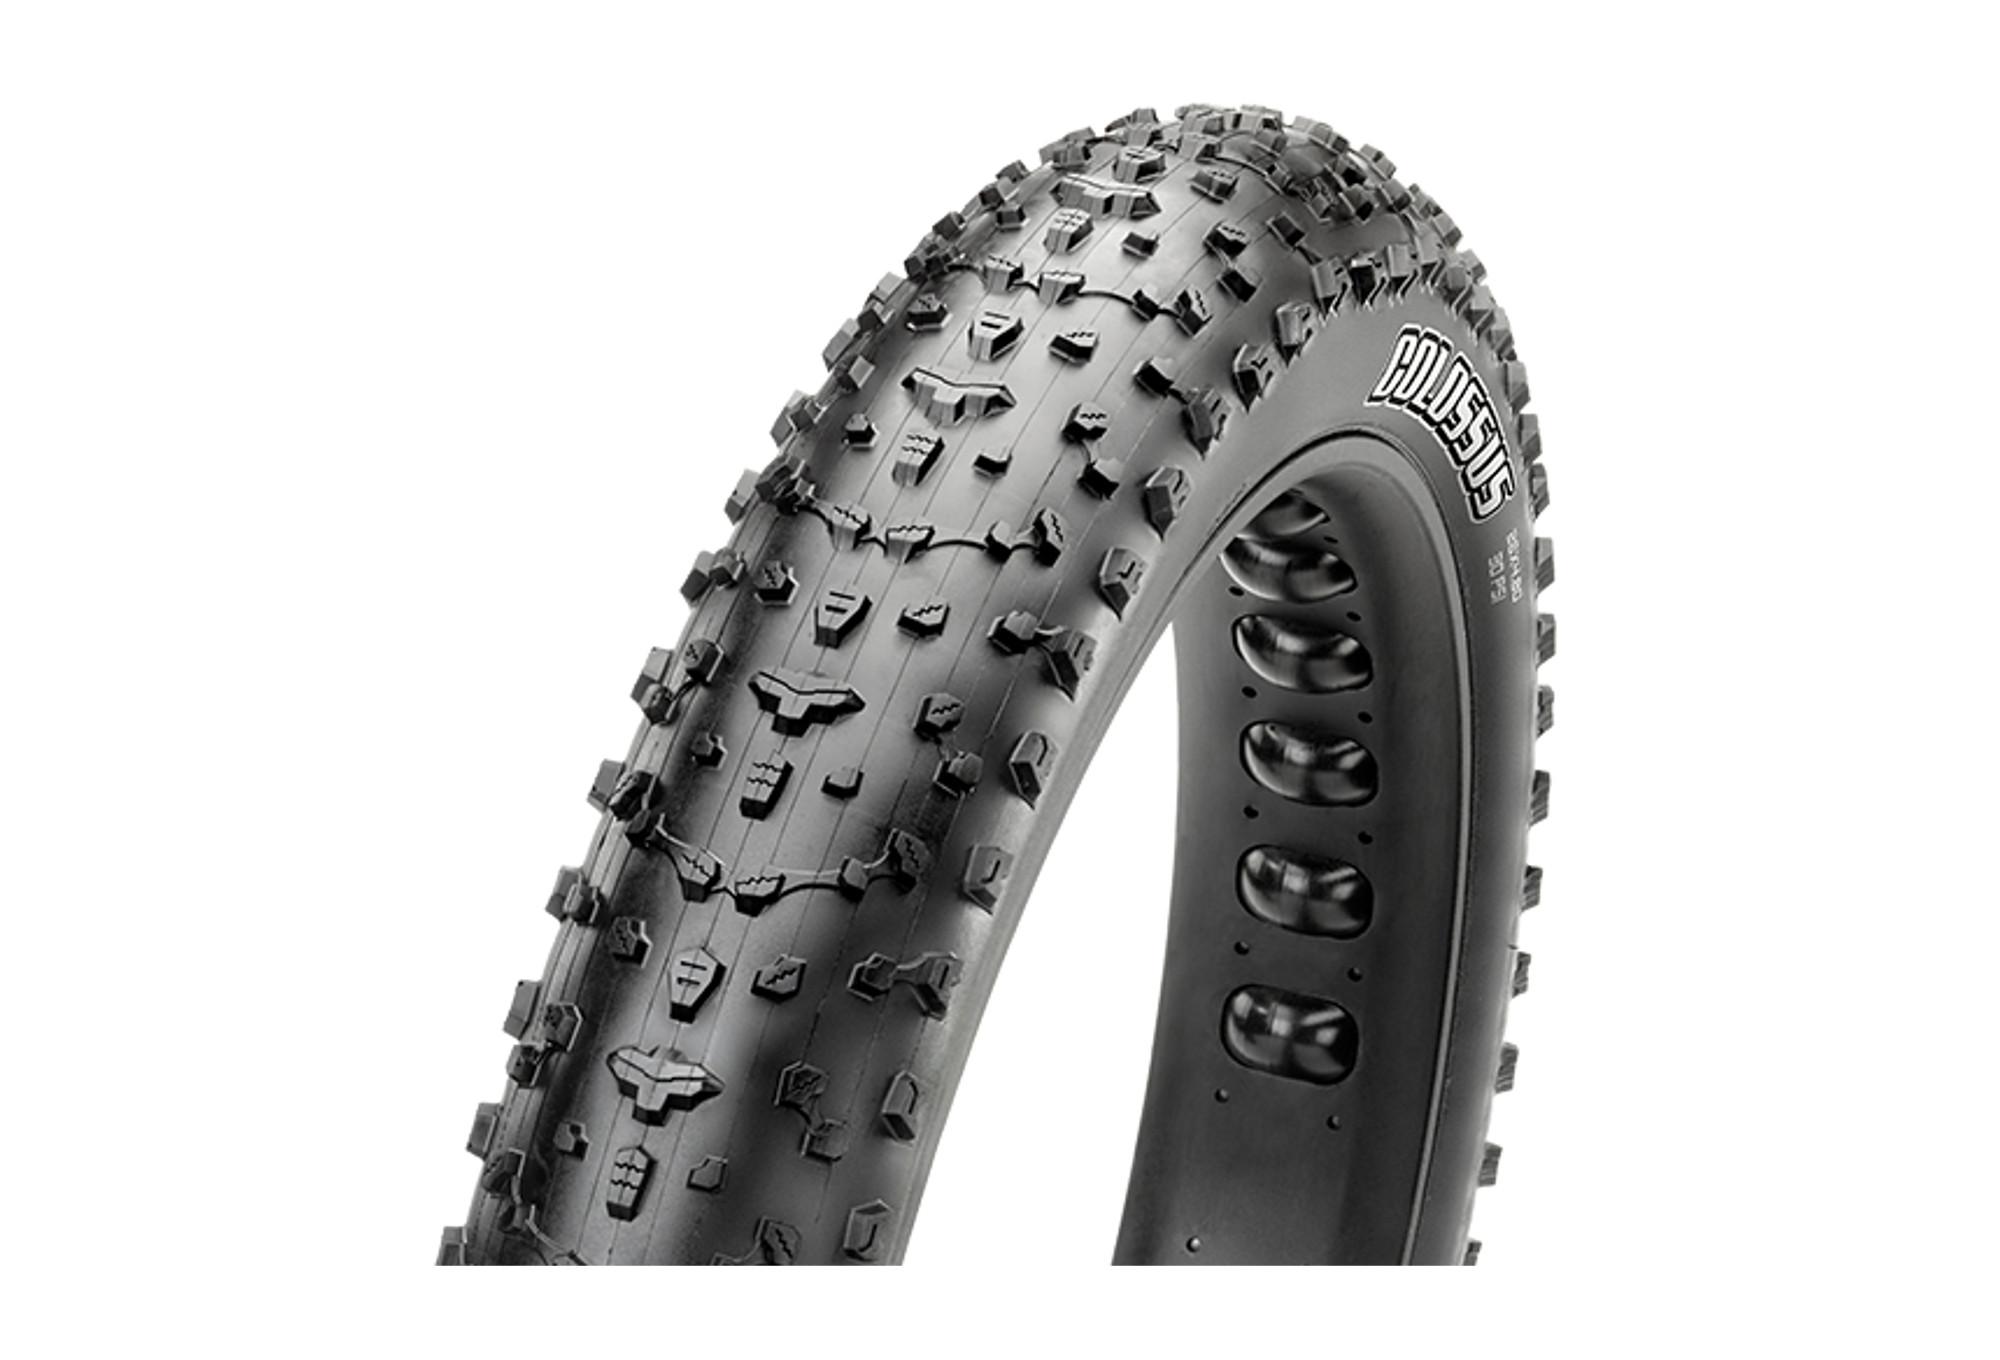 pneu fat bike maxxis colossus 26 exo tubeless ready souple tb72660000. Black Bedroom Furniture Sets. Home Design Ideas